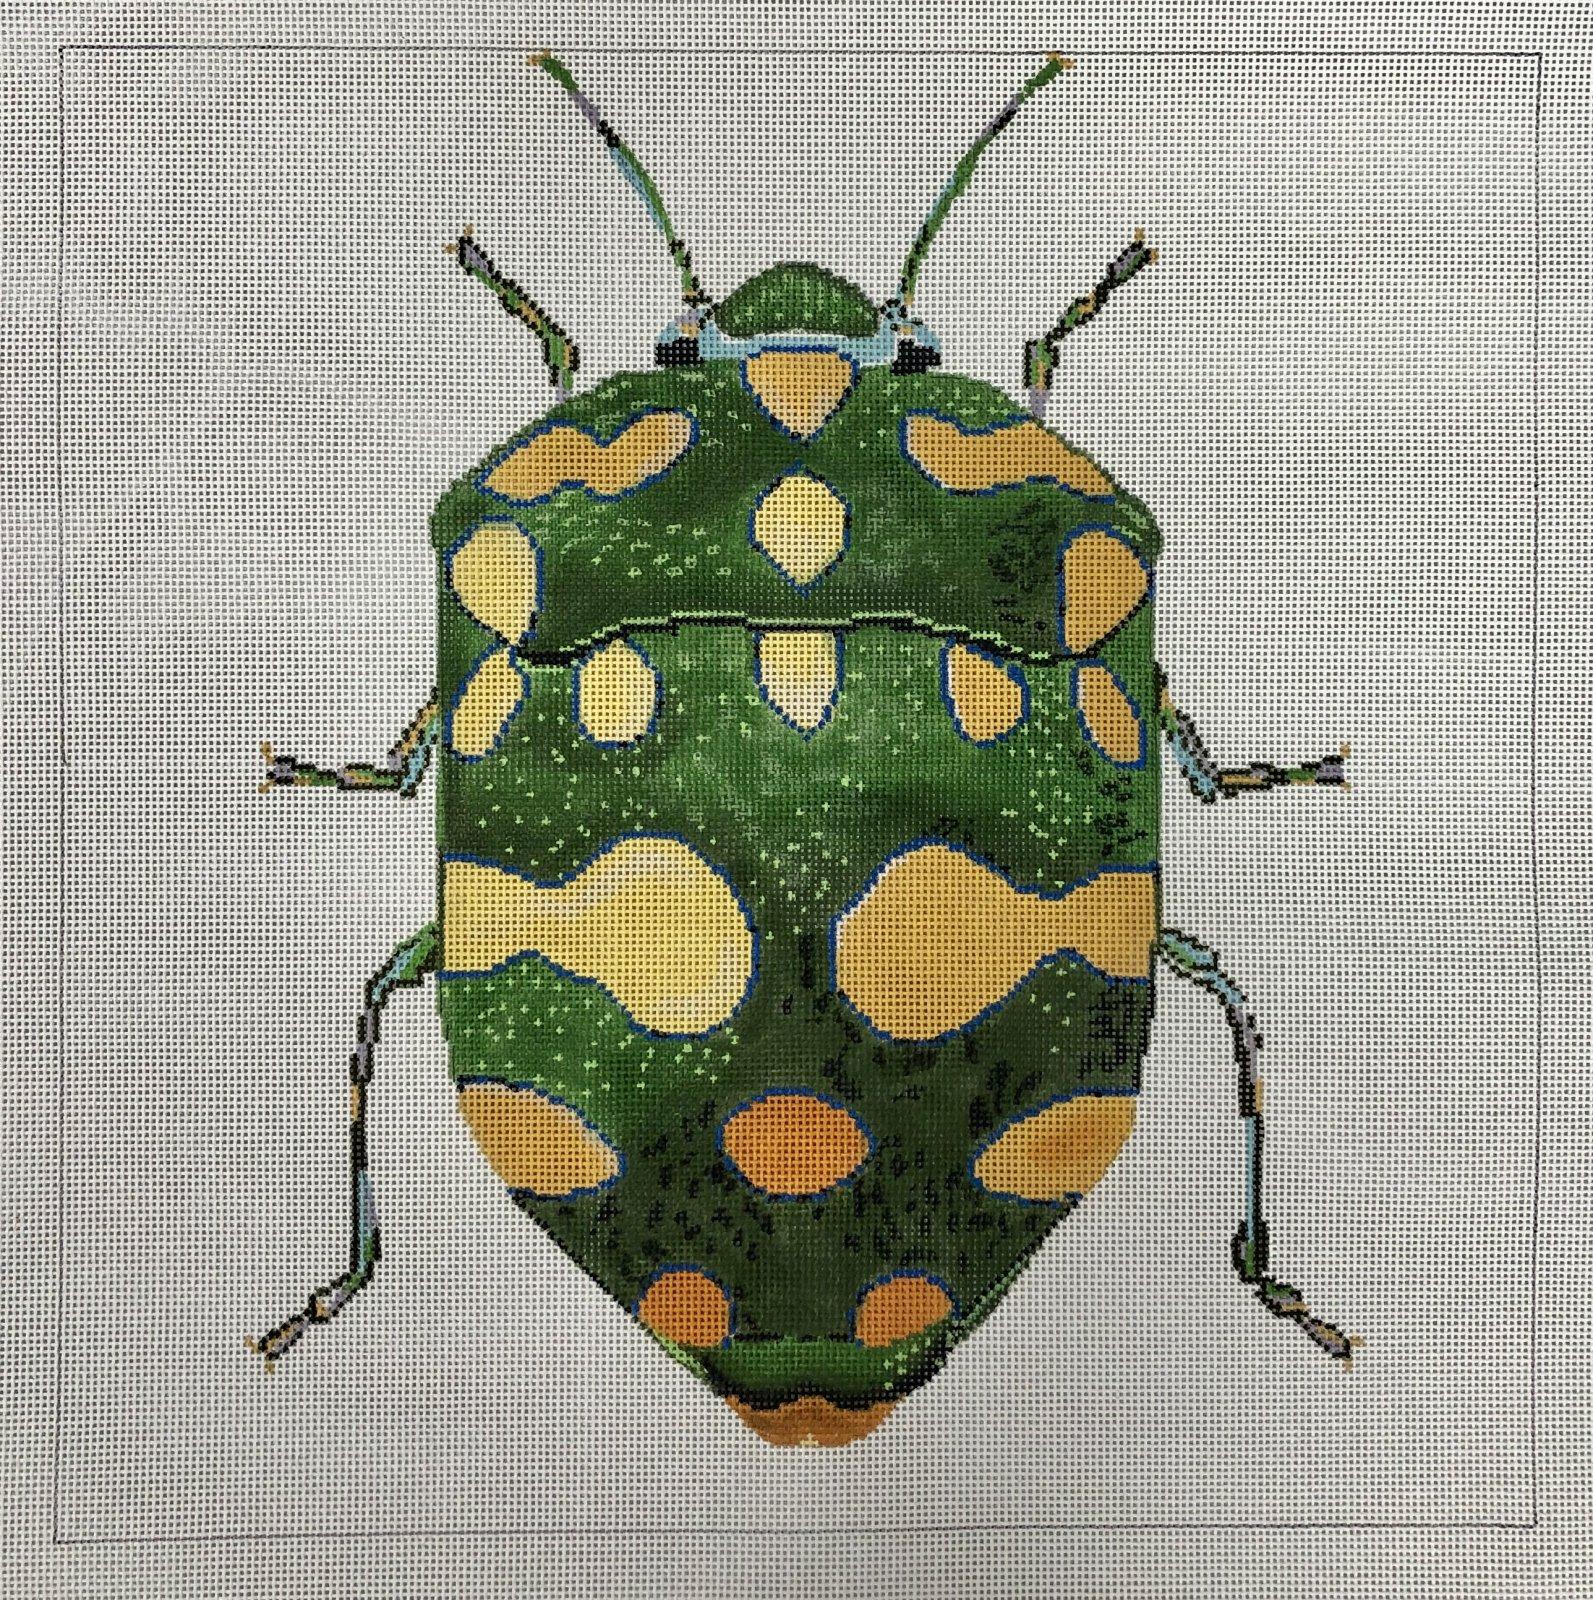 big green & yellow bug